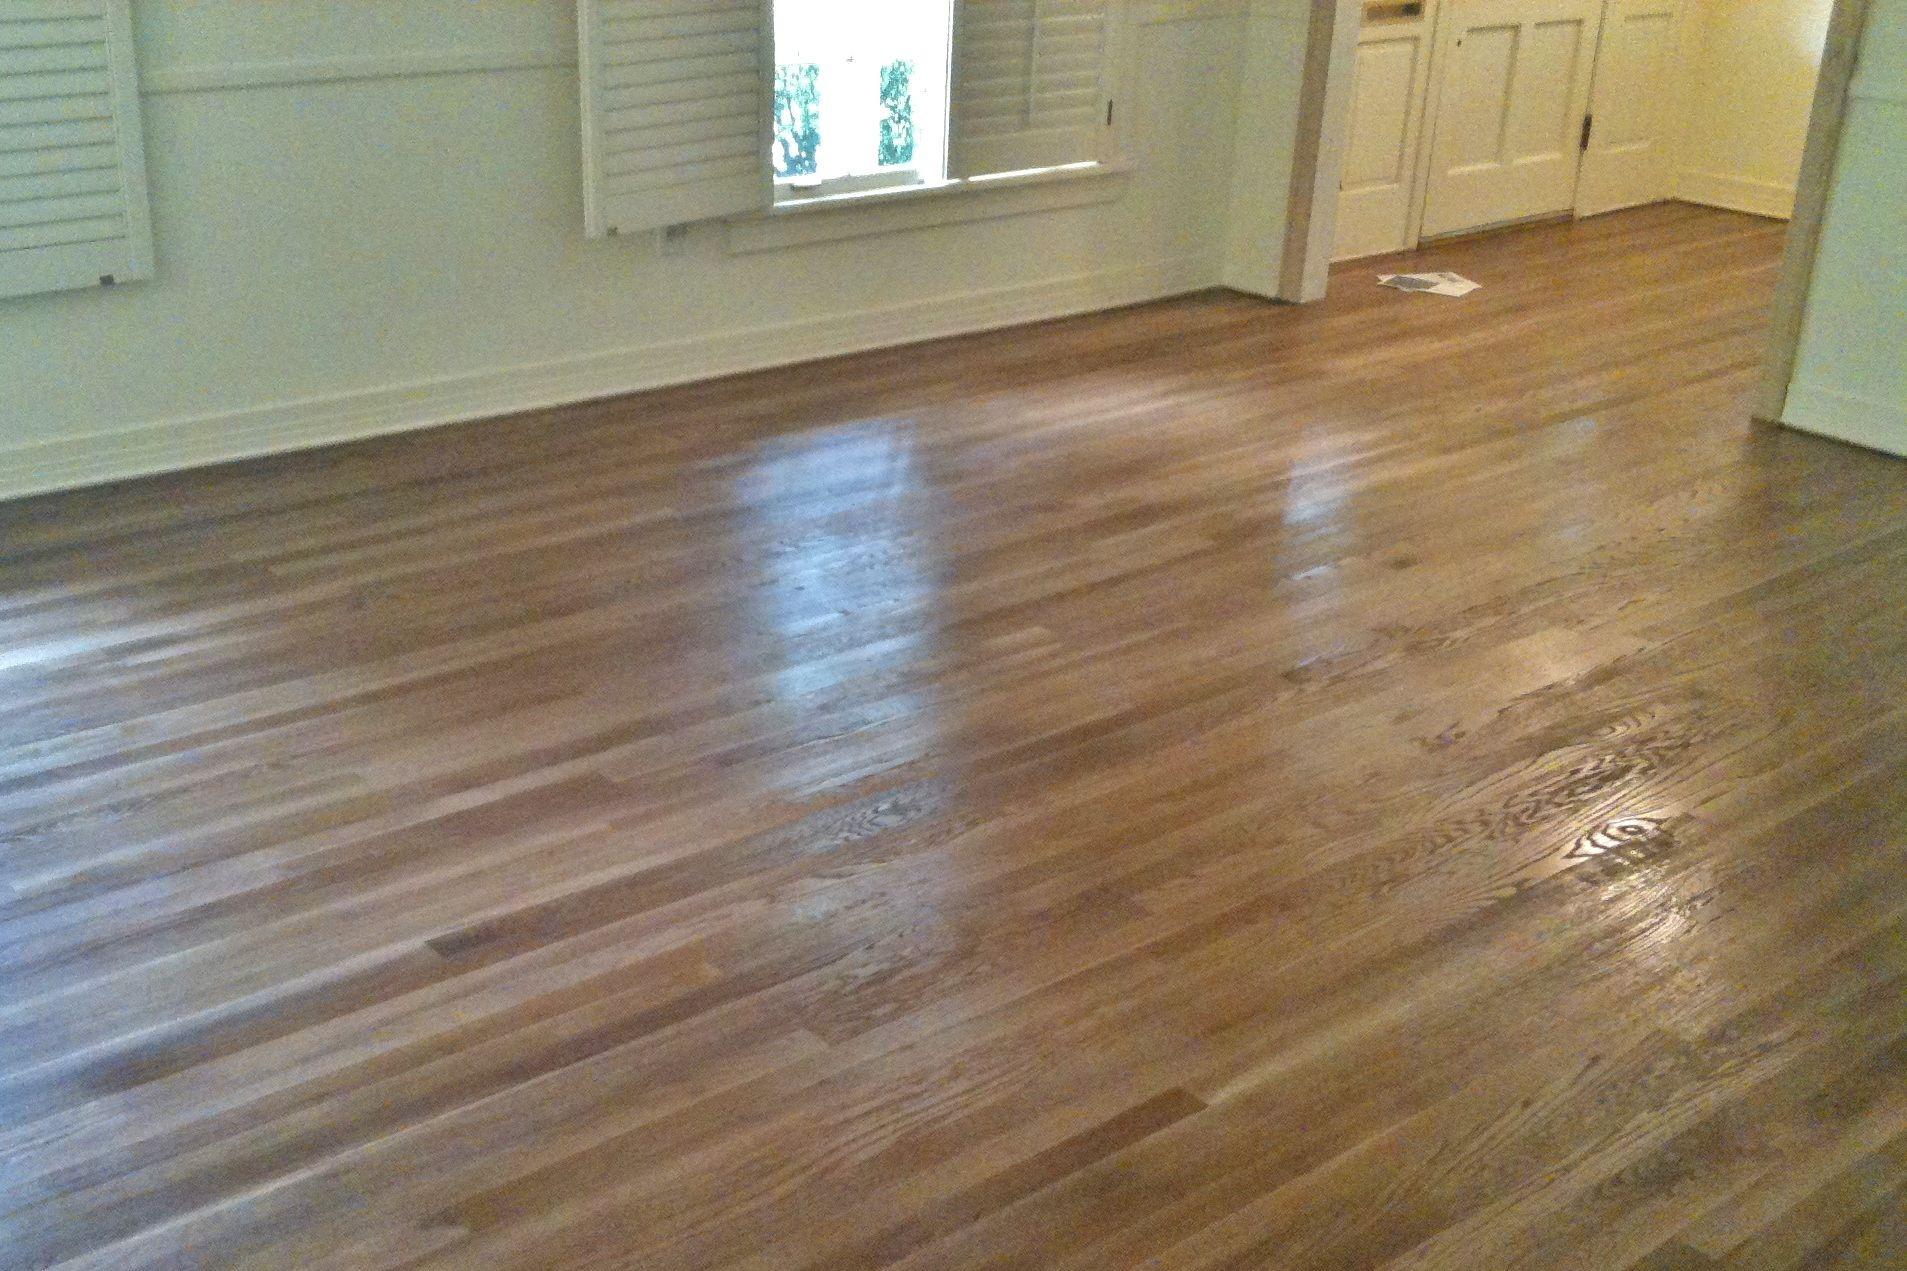 selecting hardwood floor color of oak meet special walnut home design pinterest flooring for minwax special walnut stain on oak hardwood floors